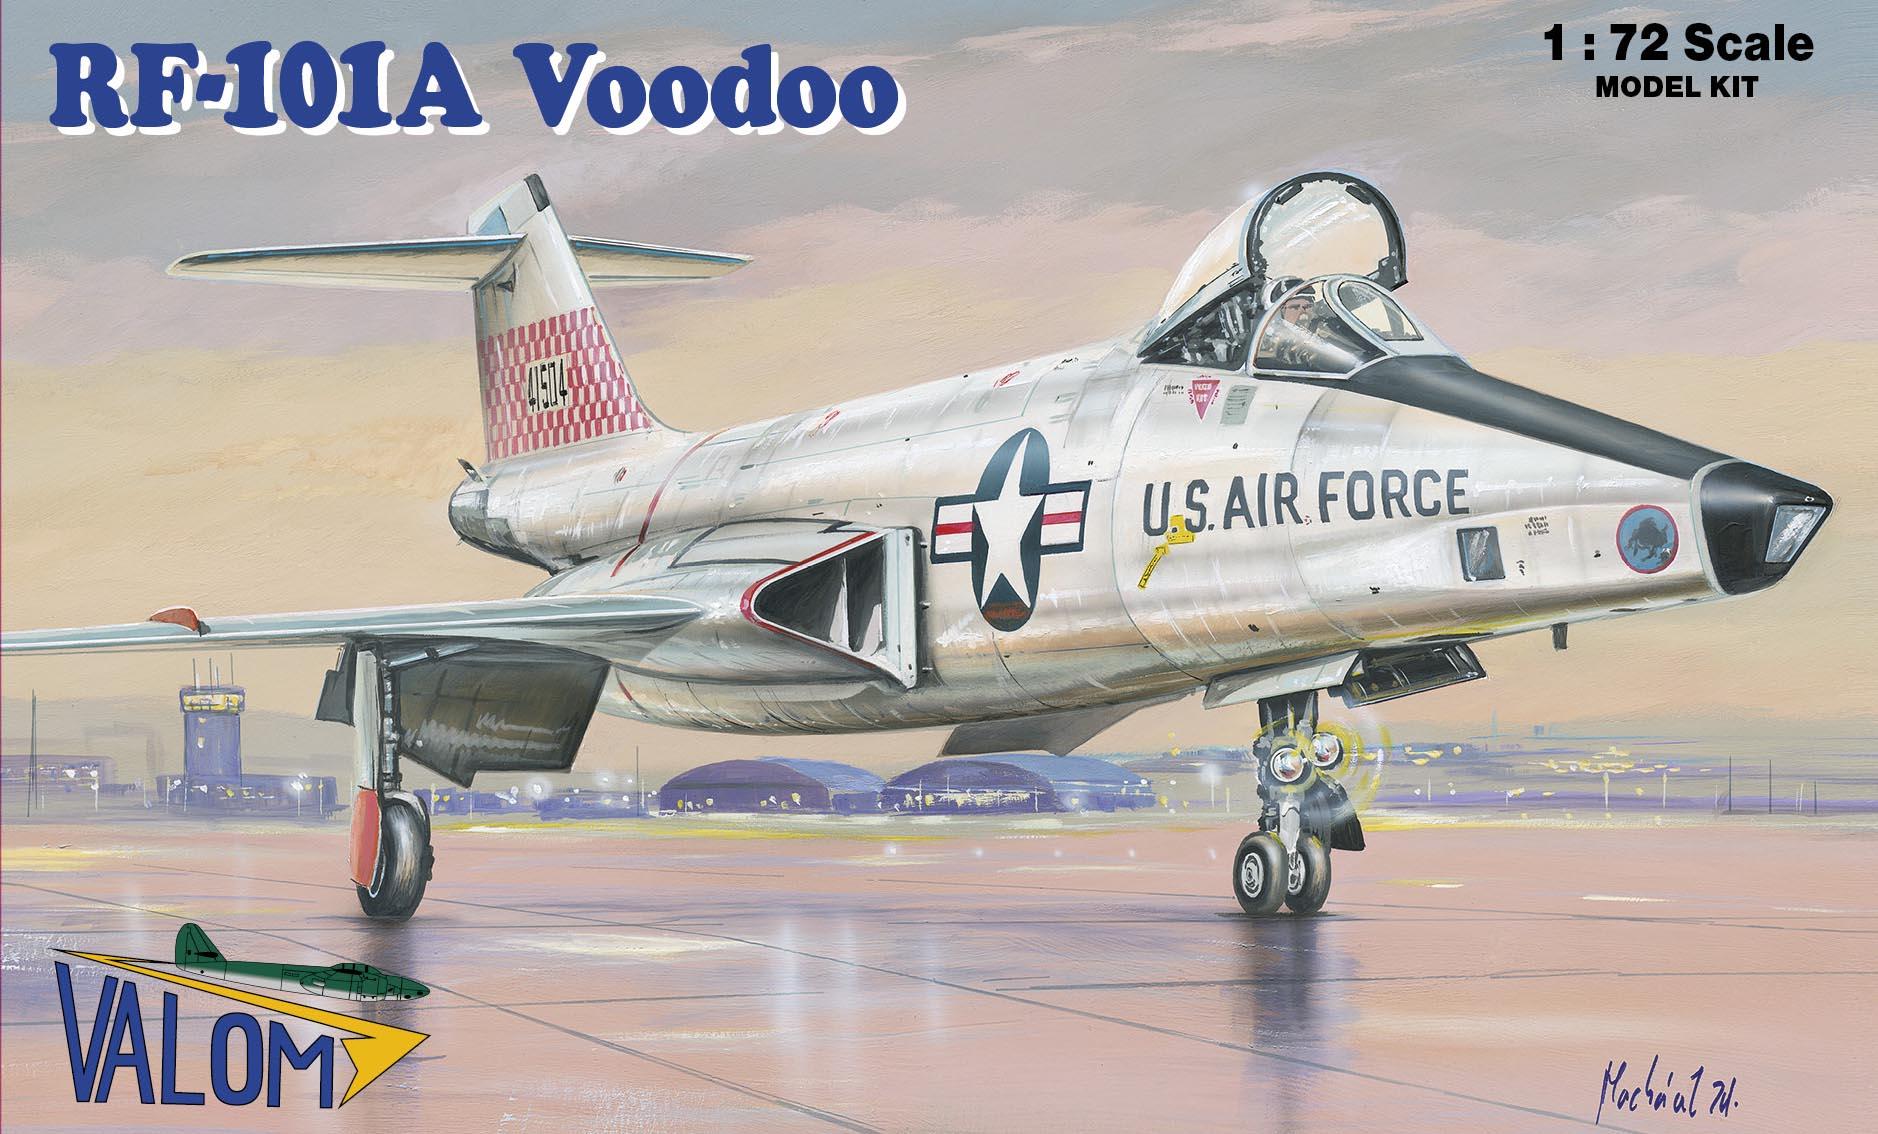 Valom 1/72 RF-101A Voodoo